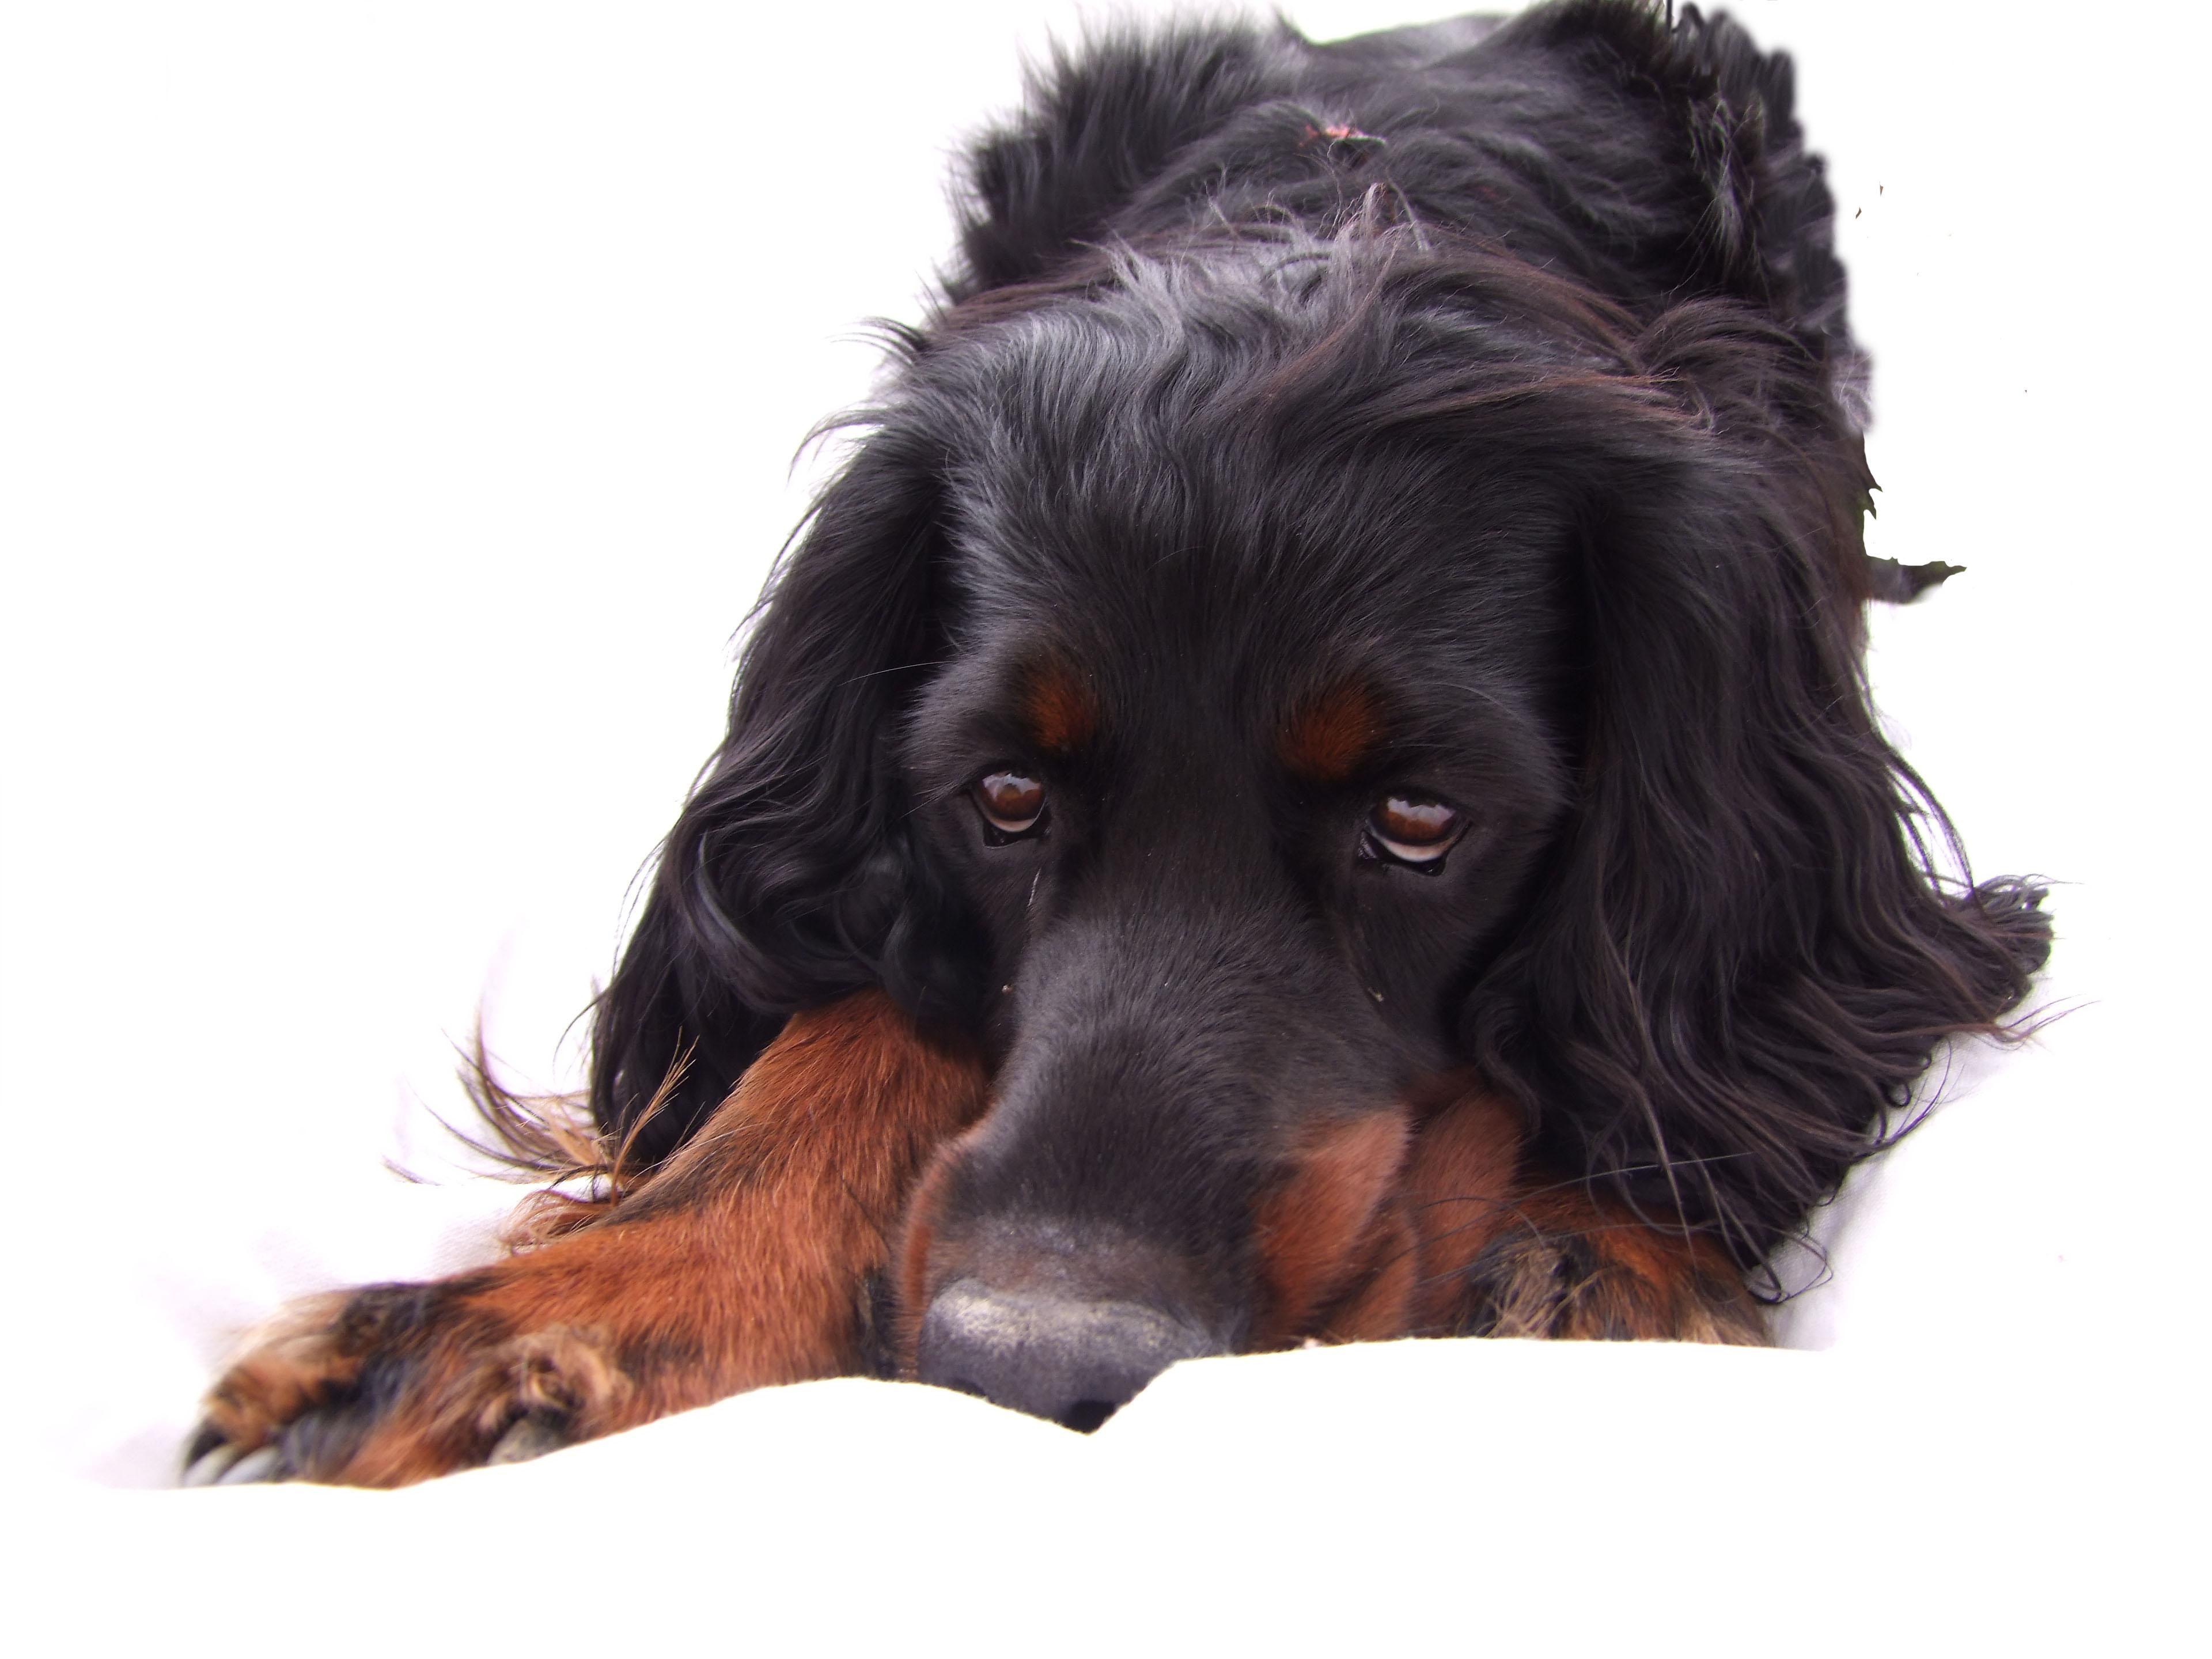 Sad Gordon Setter dog wallpaper